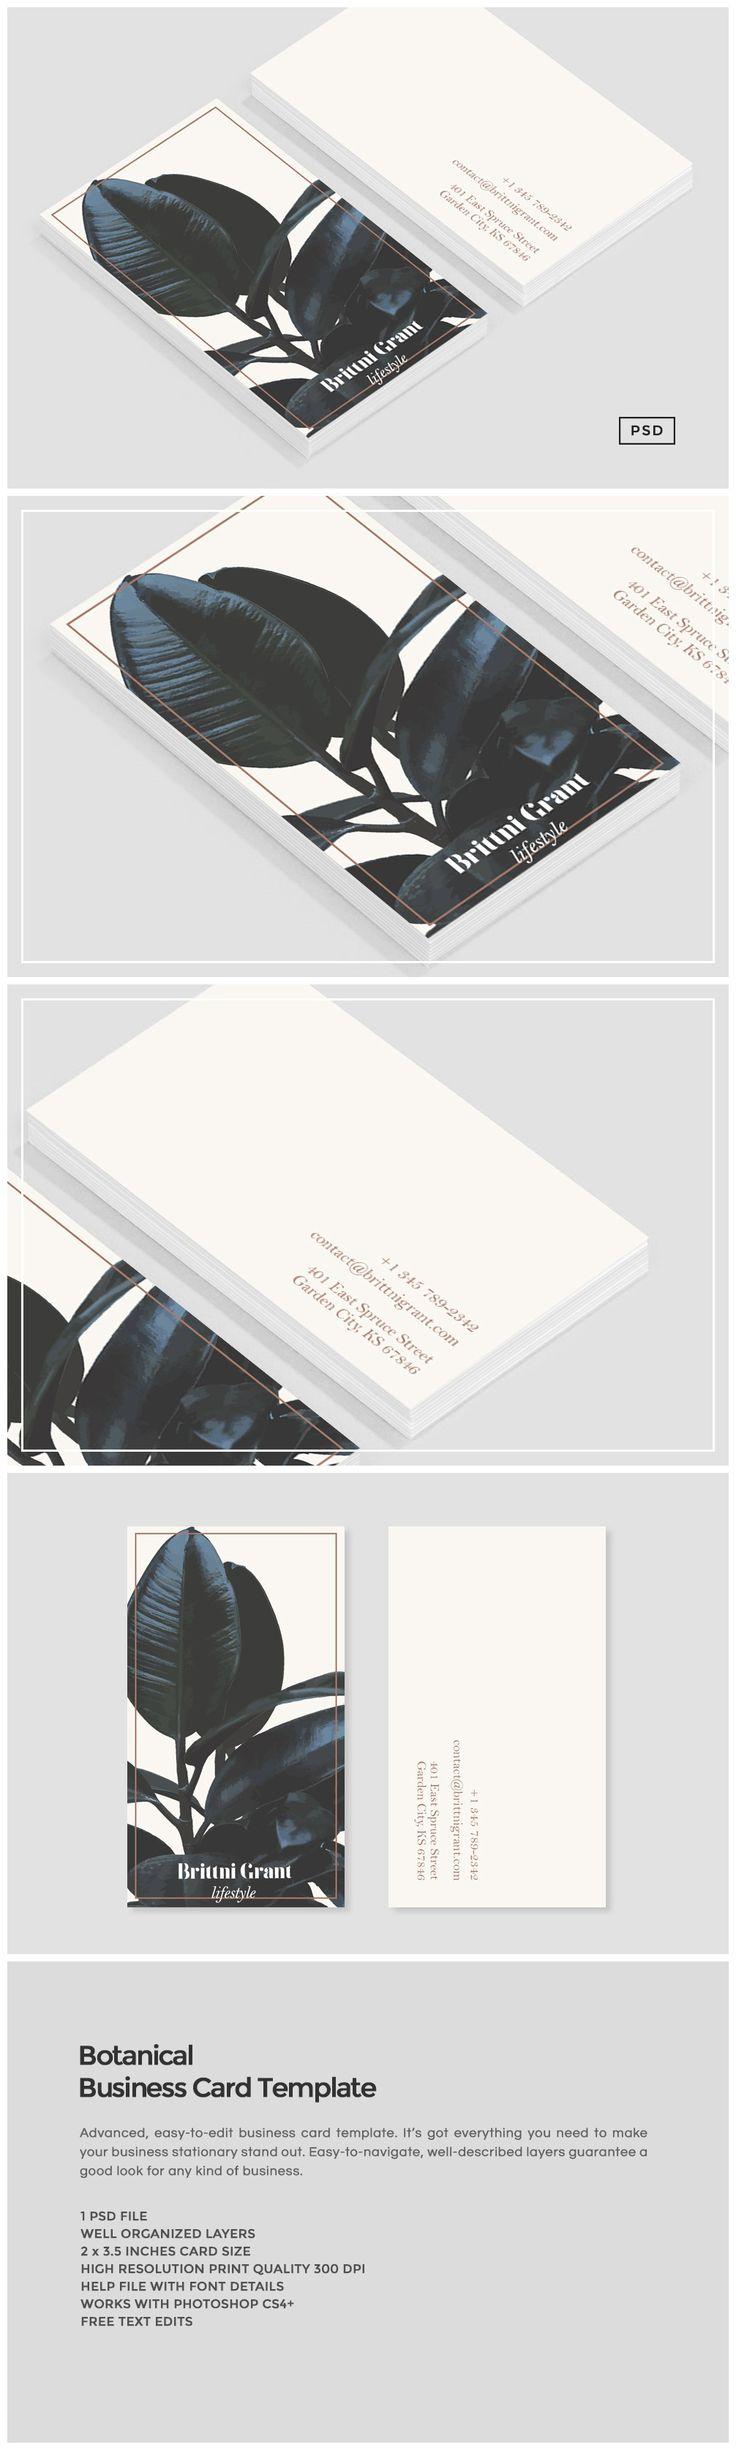 Best 25+ Business card templates ideas on Pinterest